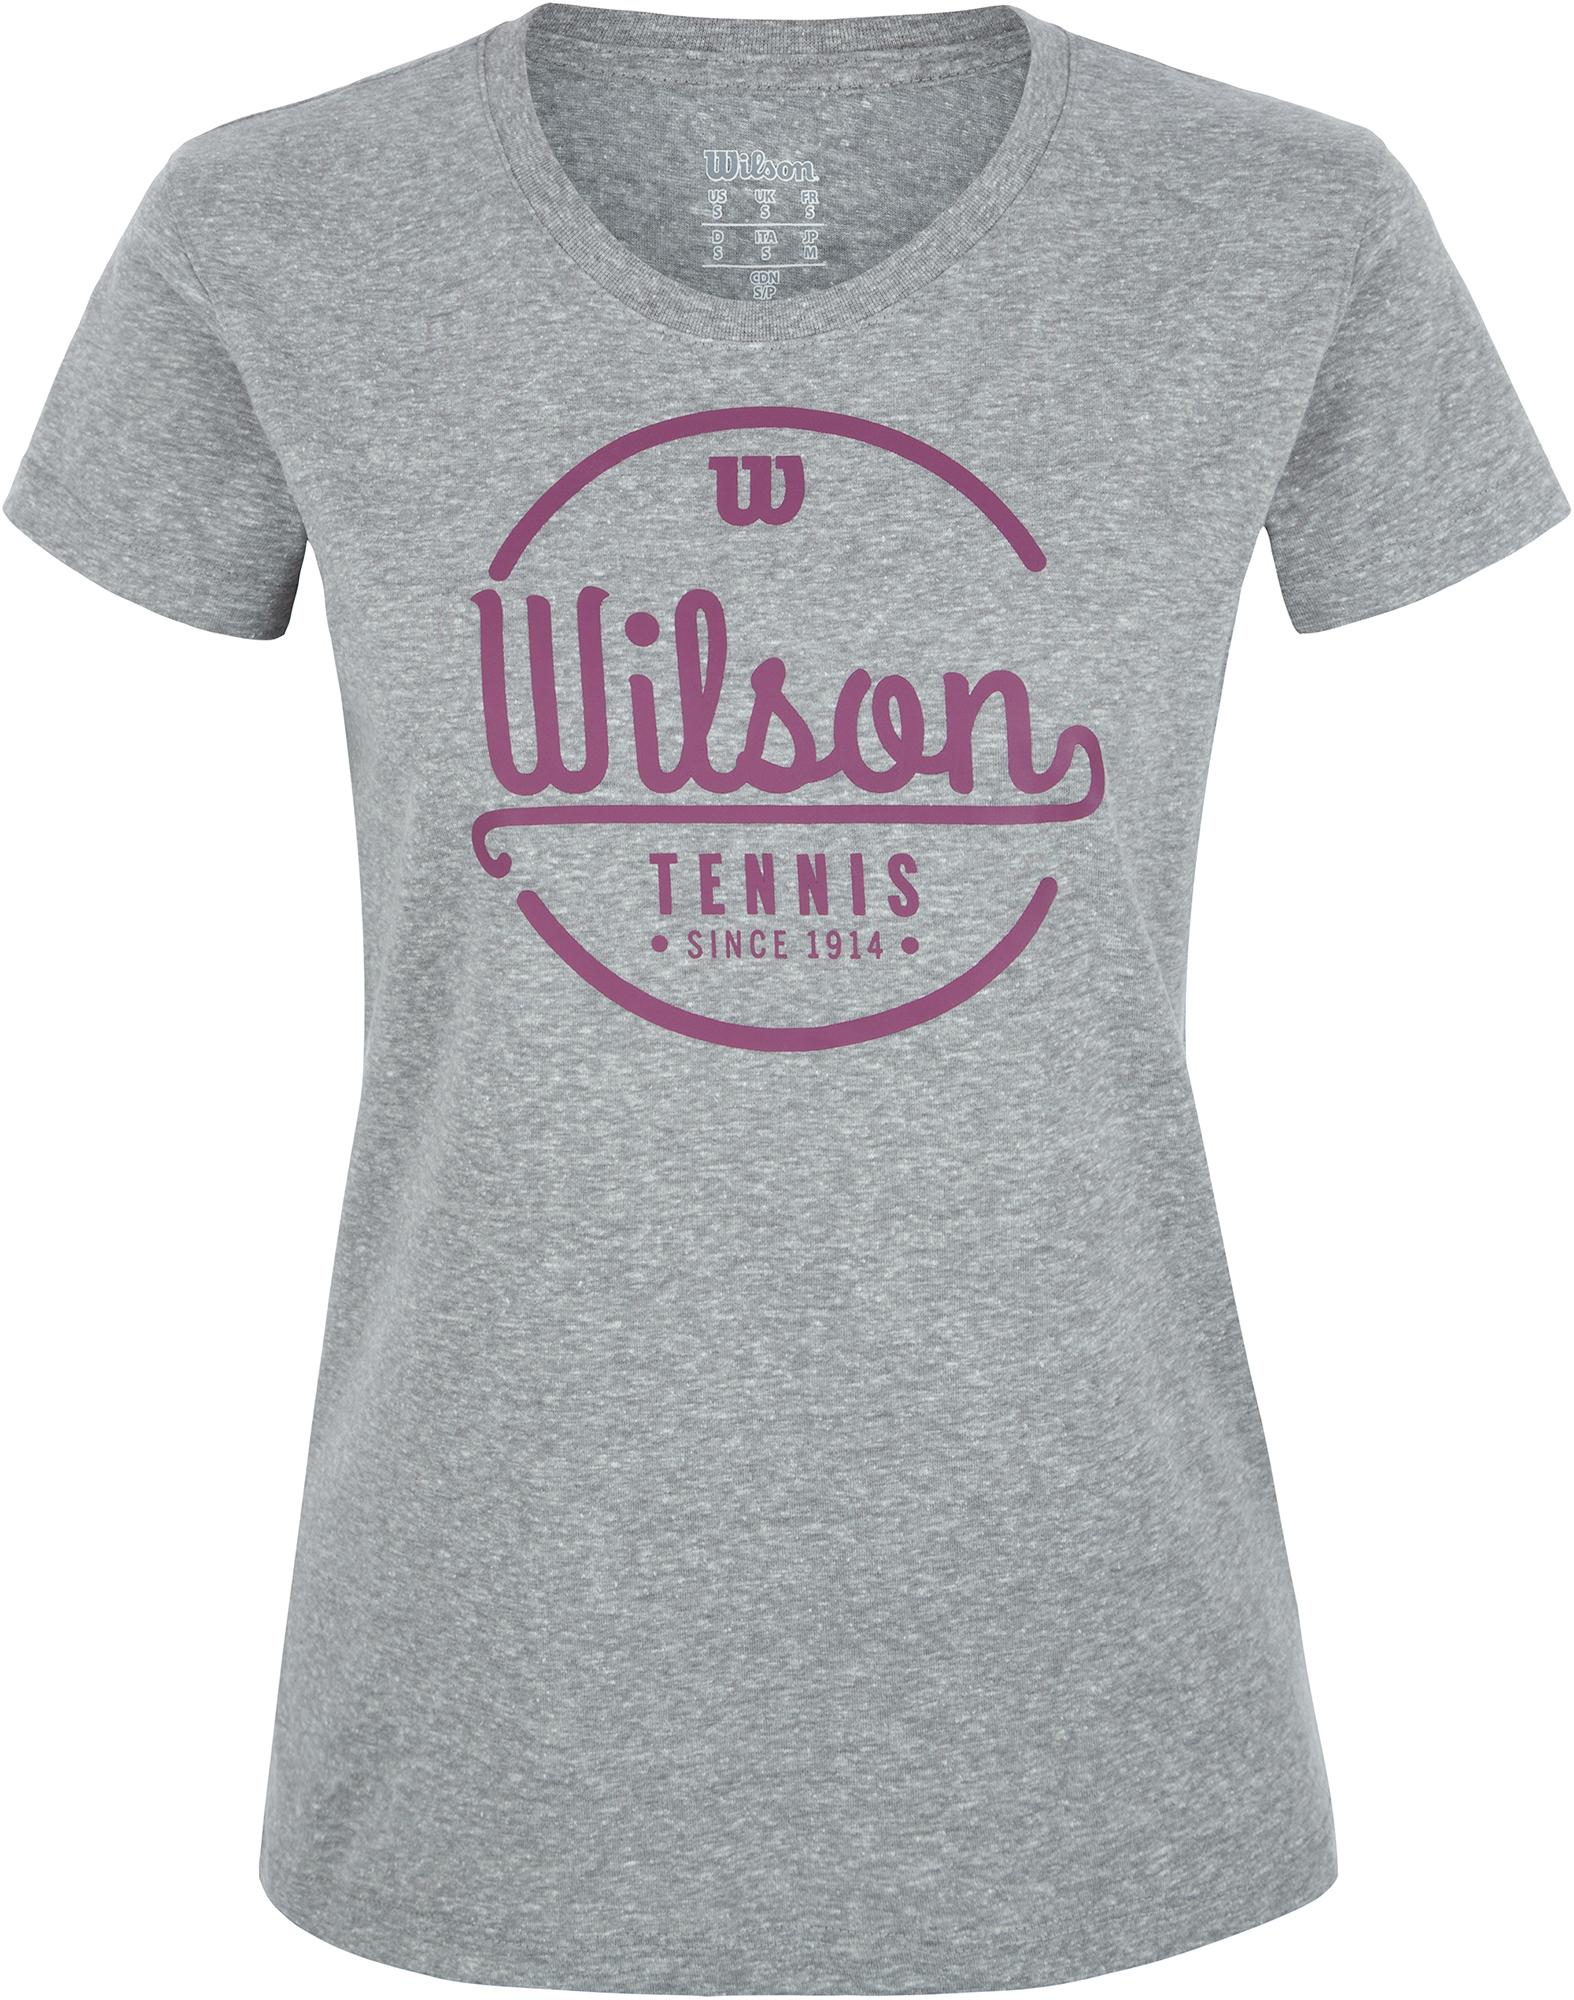 Wilson Футболка женская Wilson Lineage Tech Tee, размер 40-42 men ombre tee with drawstring shorts